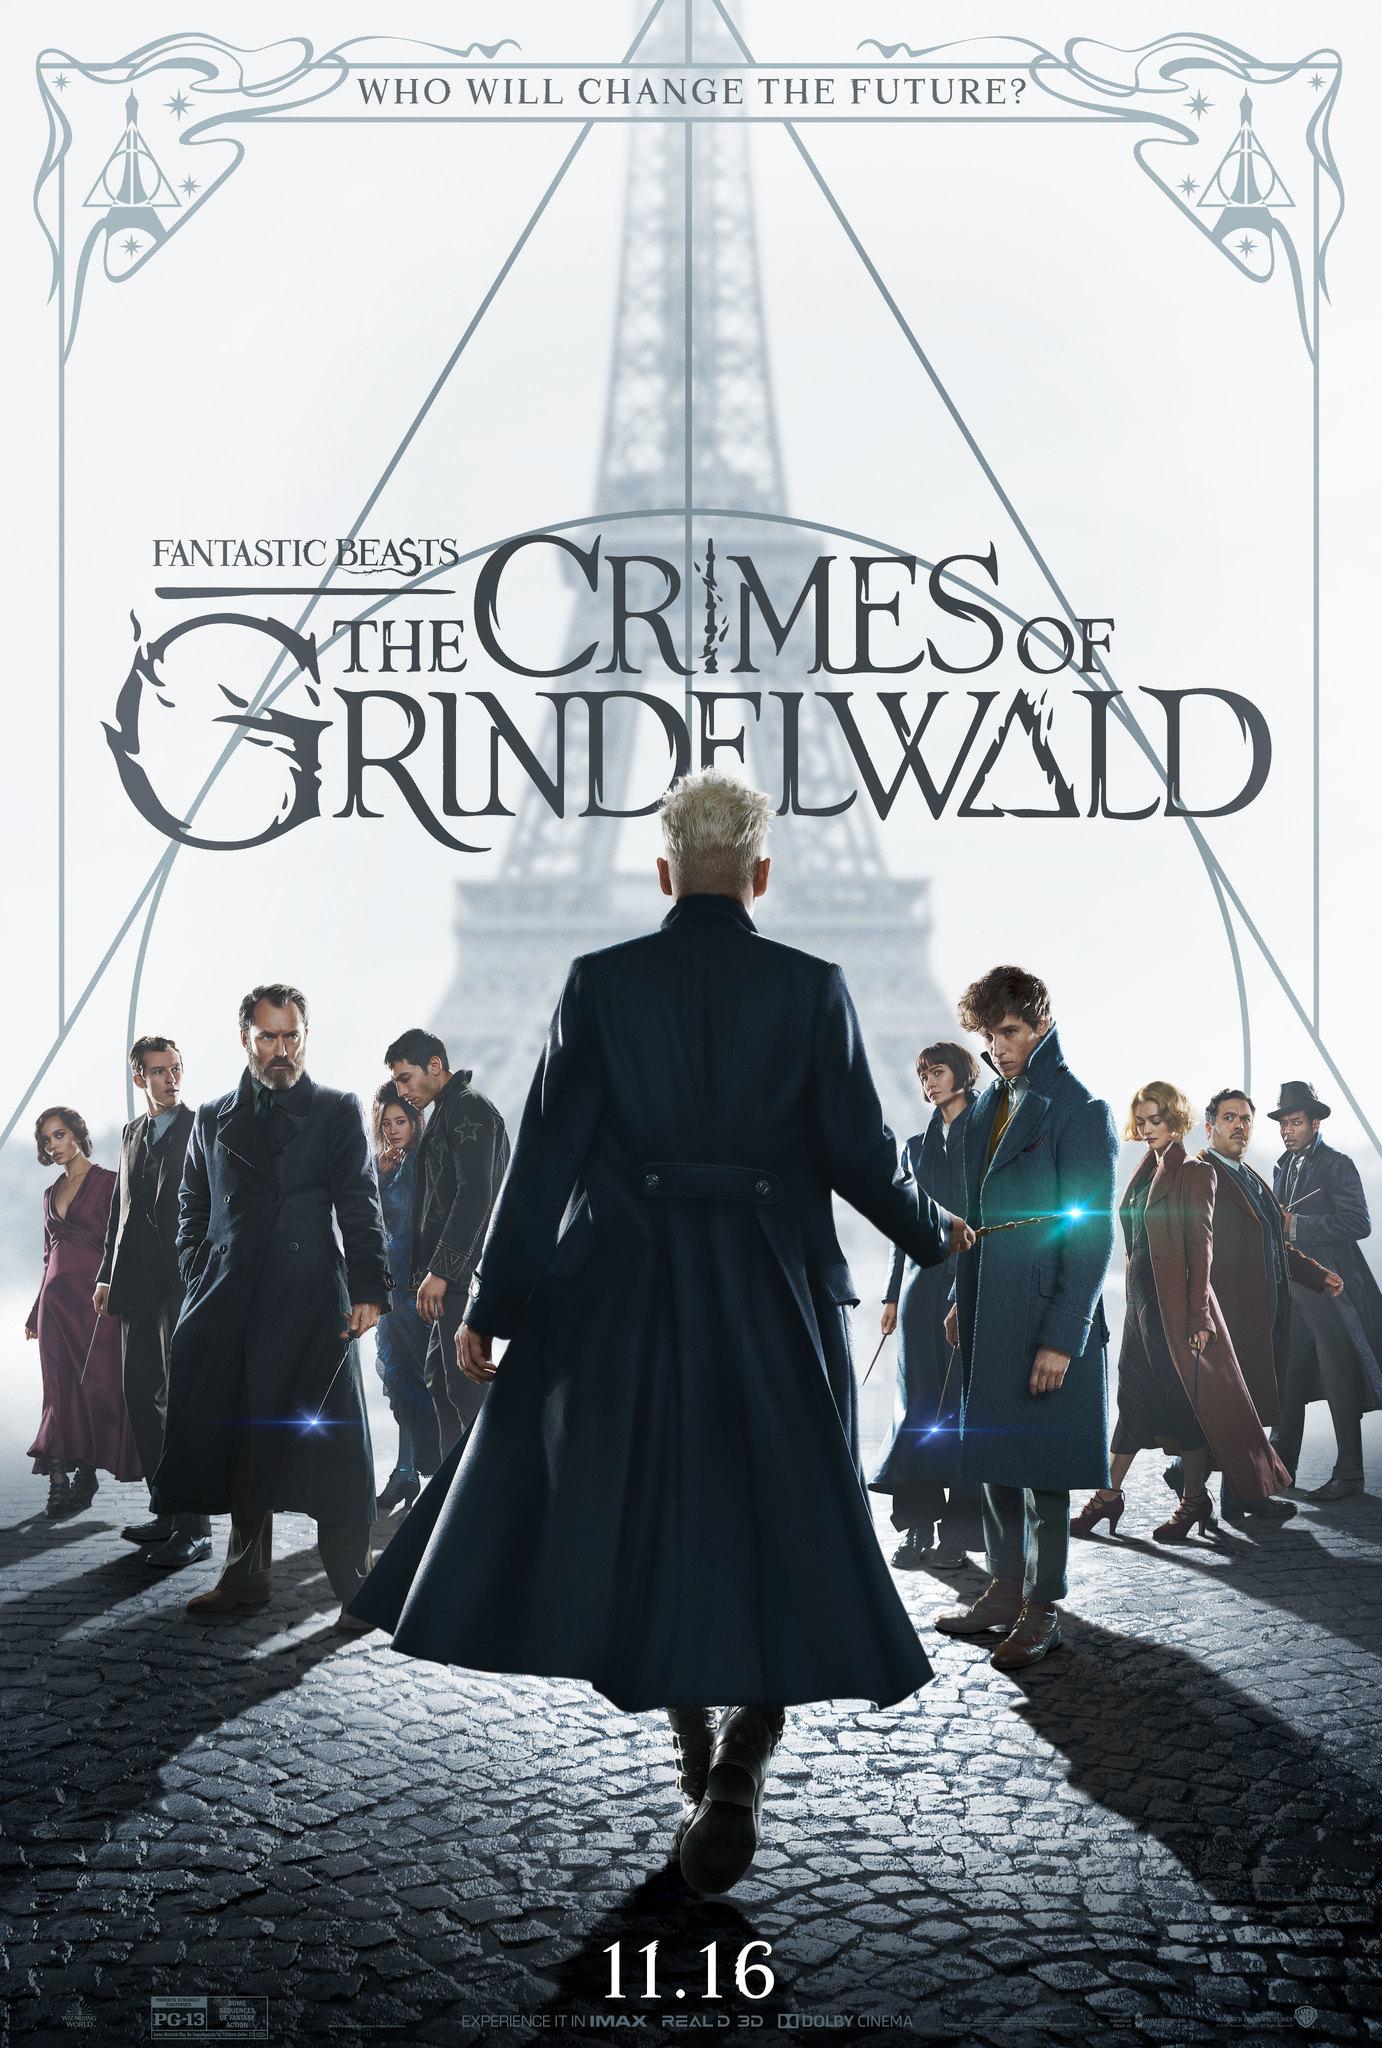 Fantastic Beasts : The Crimes of Grindelwald MV5BMjAxMjM3NjAzM15BMl5BanBnXkFtZTgwNDQxNjA1NjM@._V1_